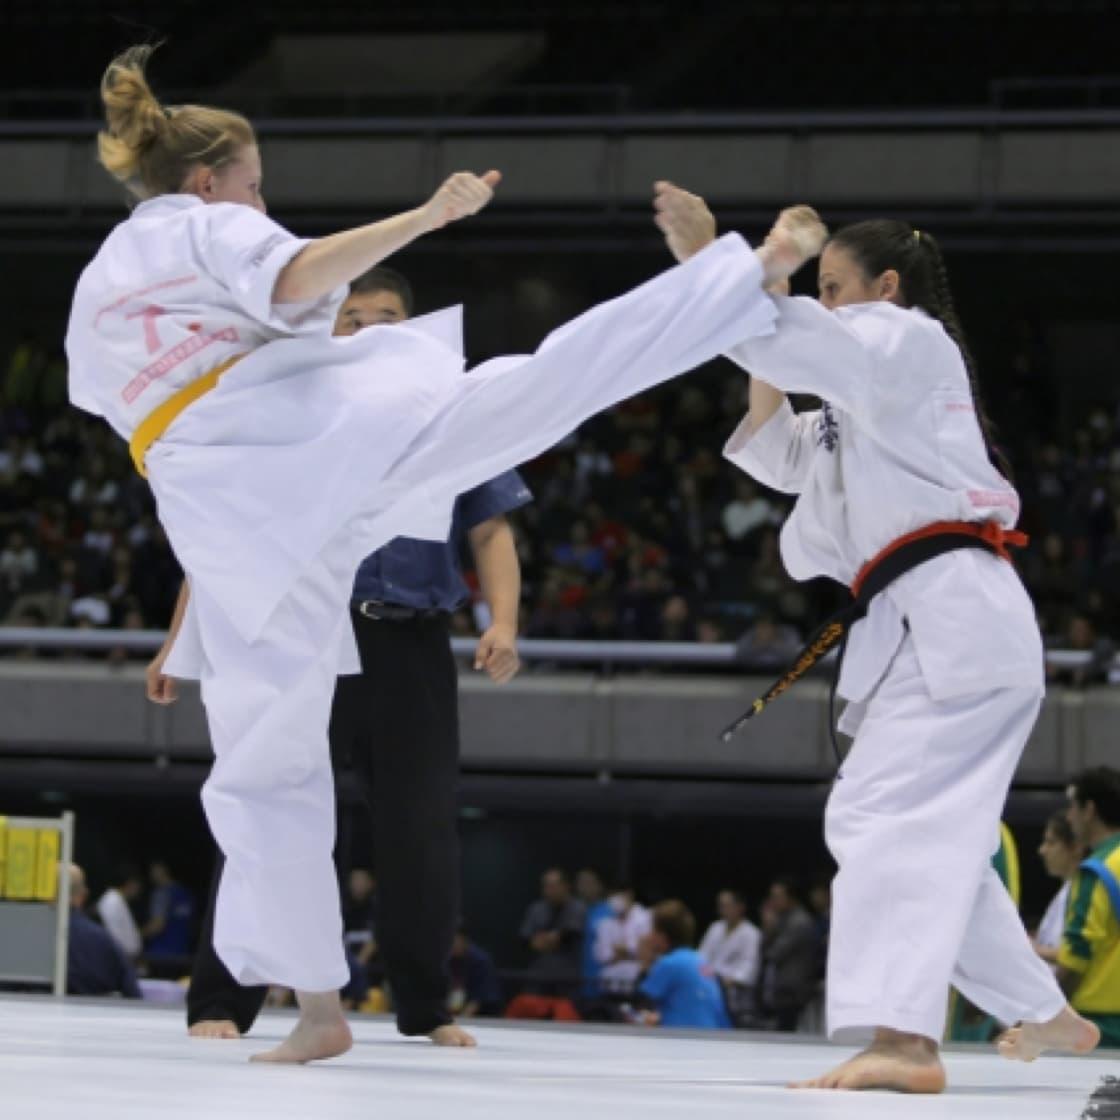 kyokushin fight